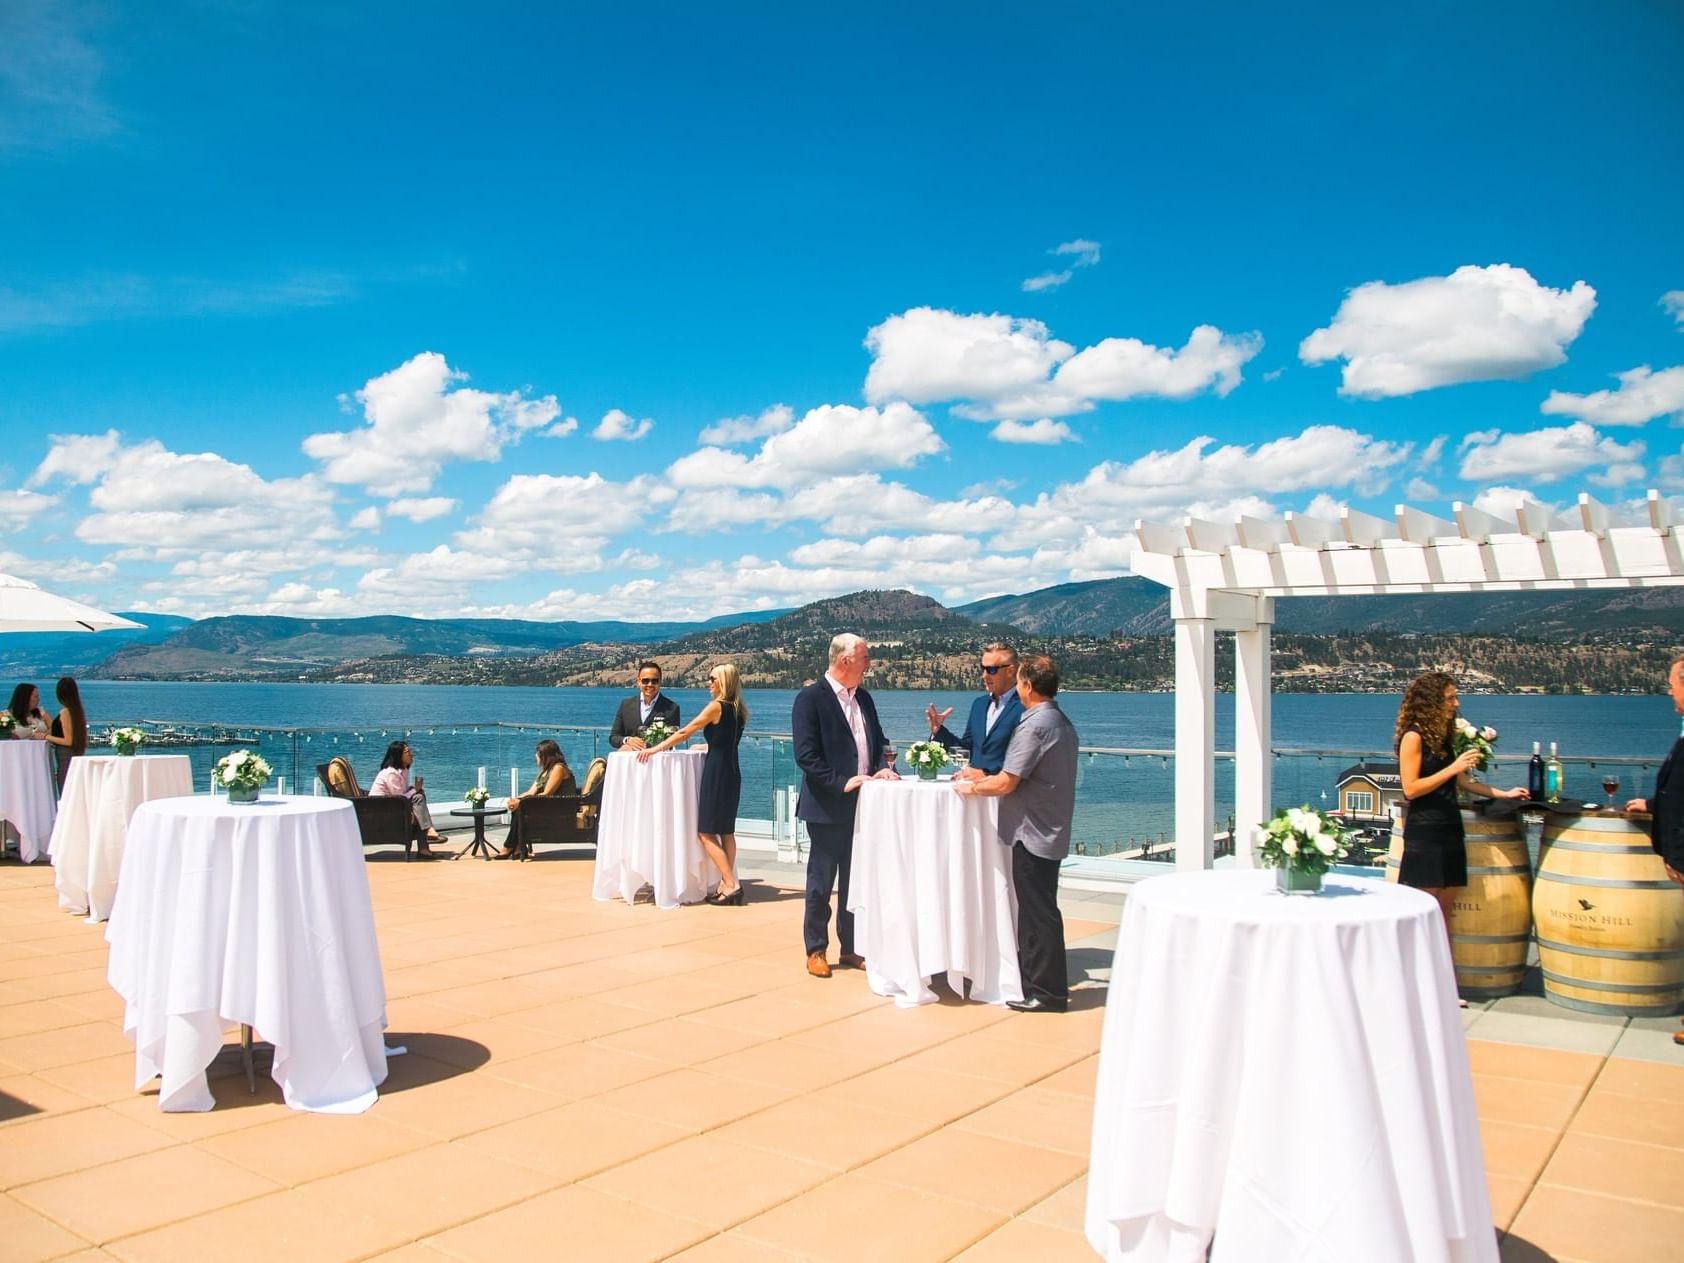 Wedding reception arrangements in the Sun Roof at Manteo Resort